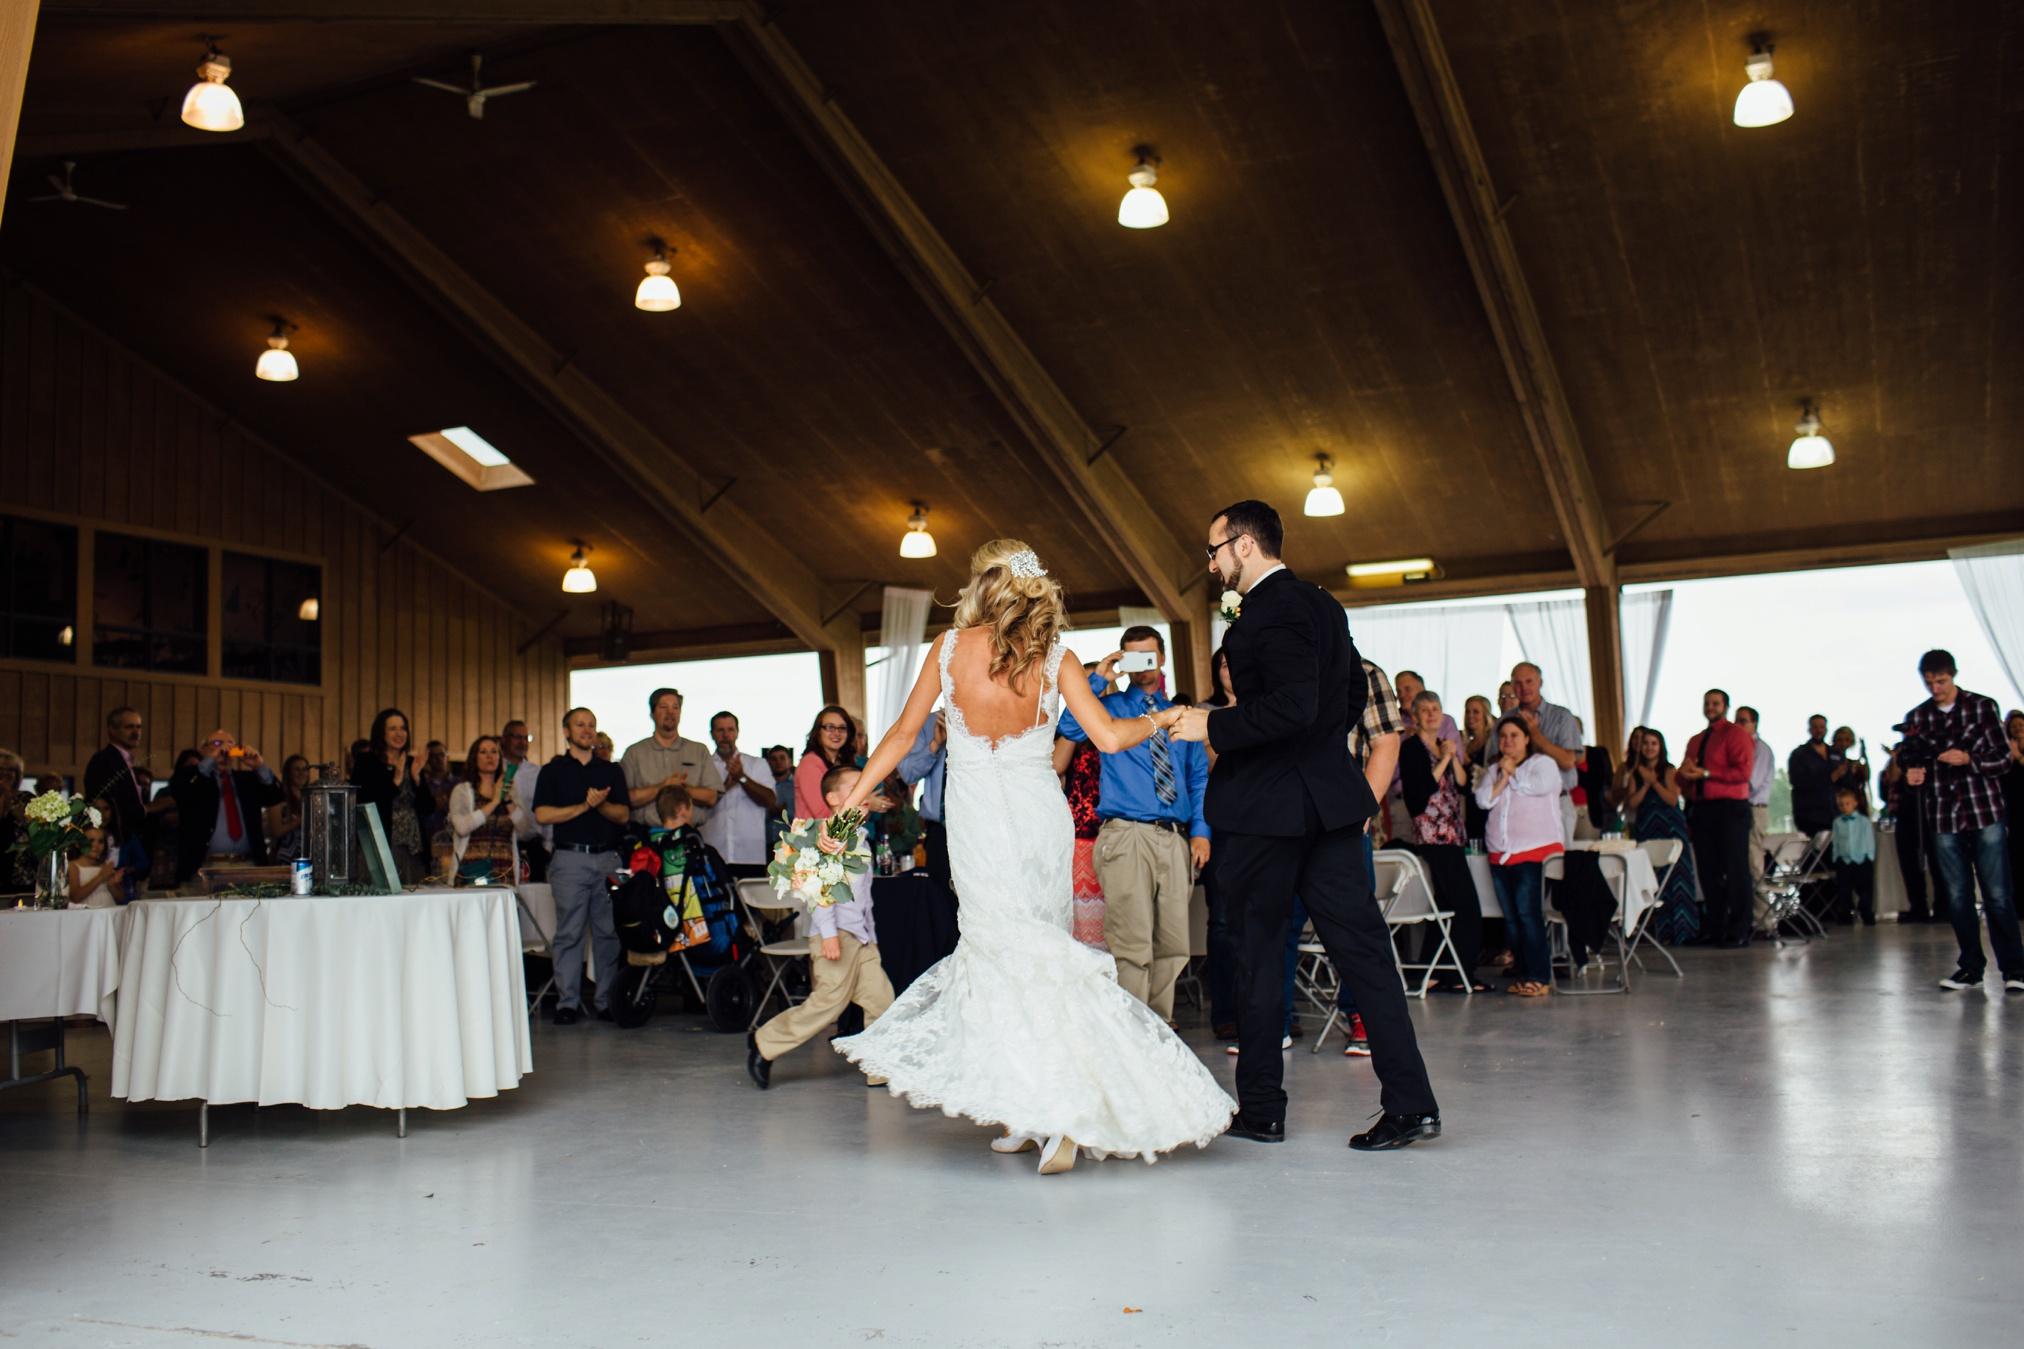 schmid_wedding-691.jpg